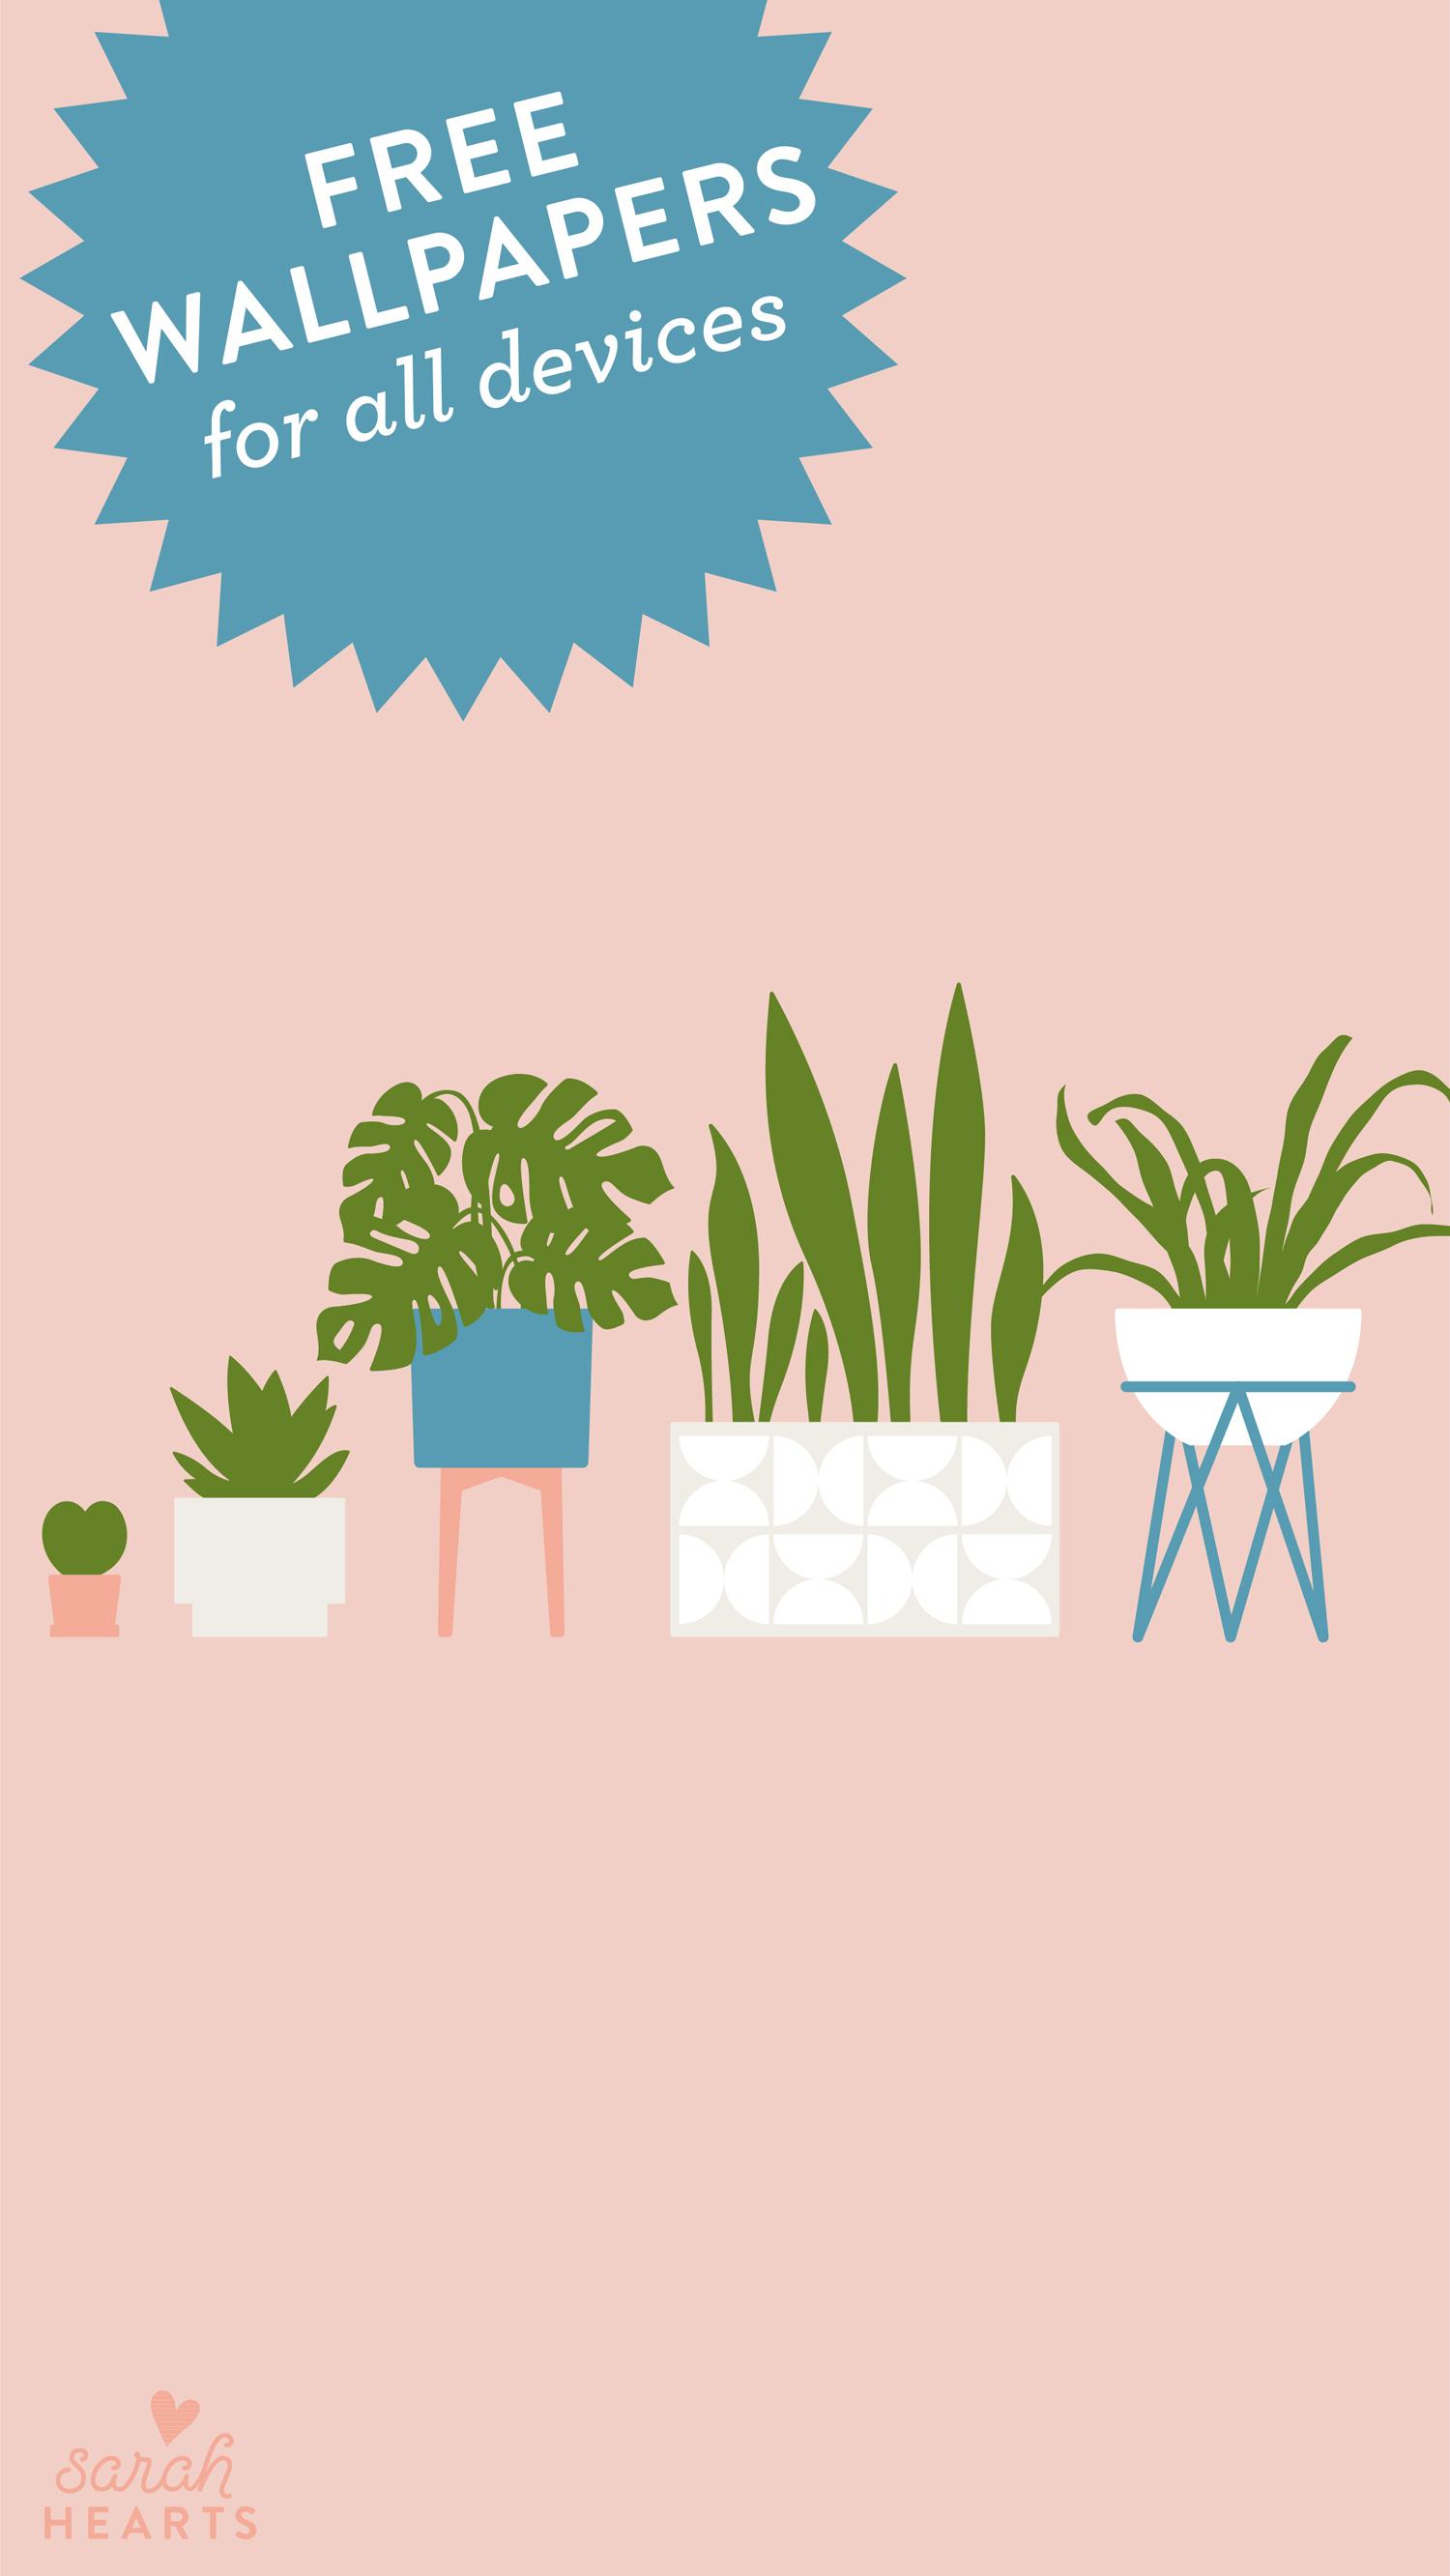 House Plant August 2019 Calendar Wallpaper Sarah Hearts